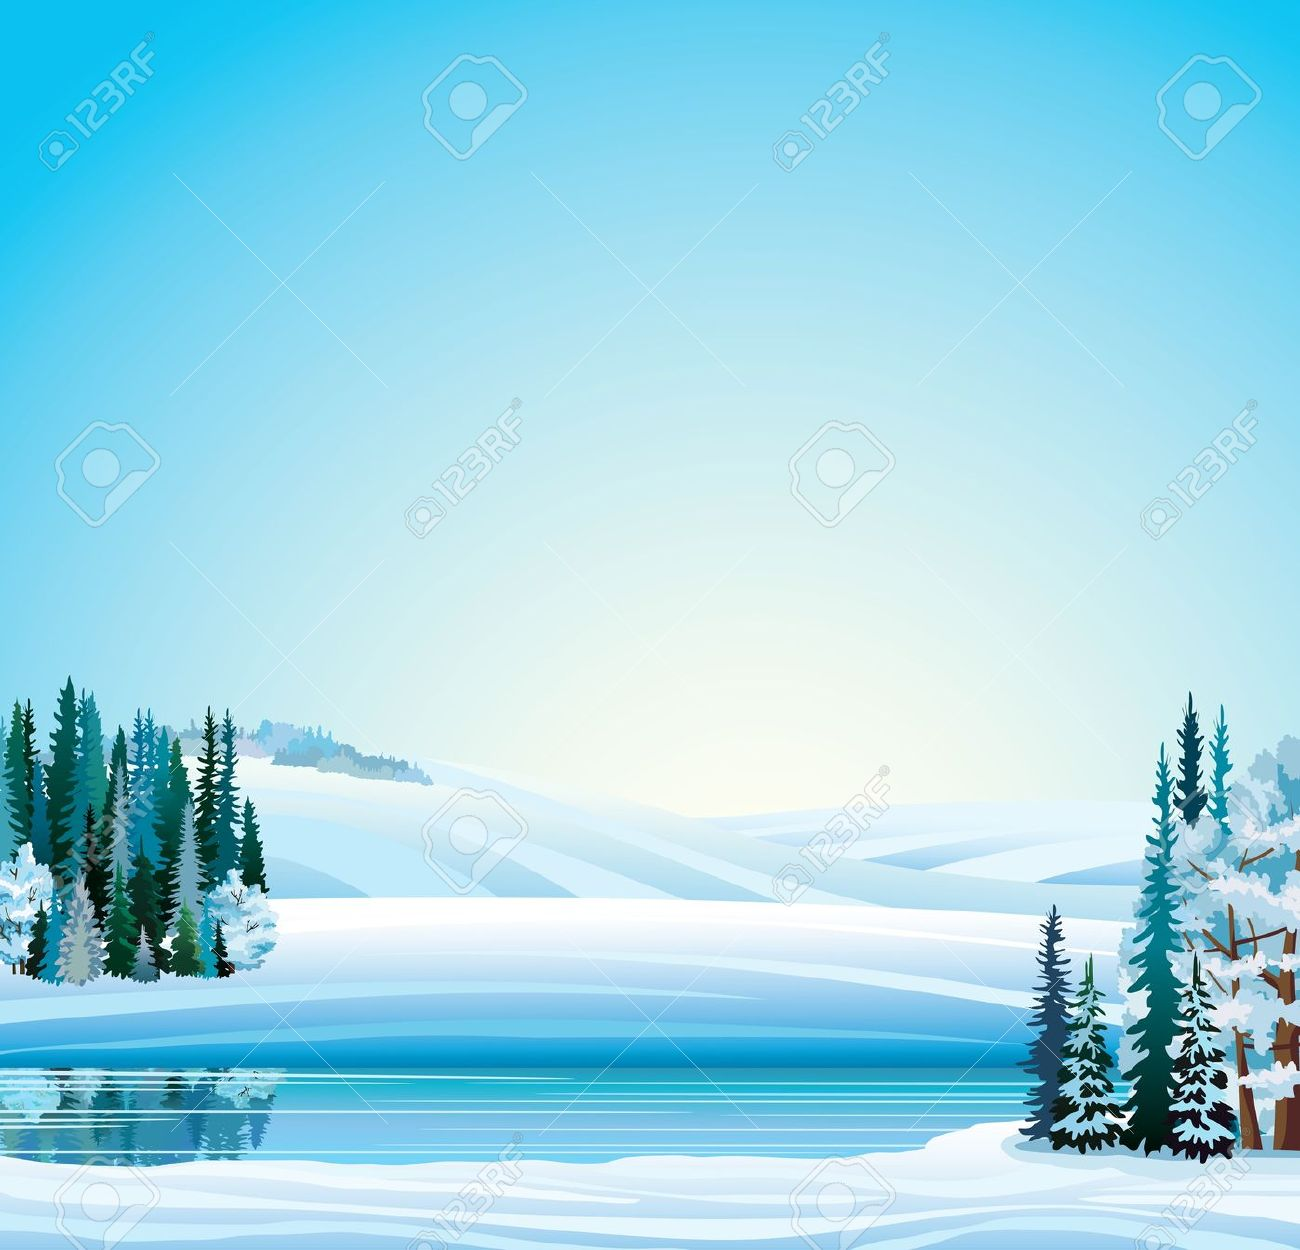 Frozen River Clip Art.